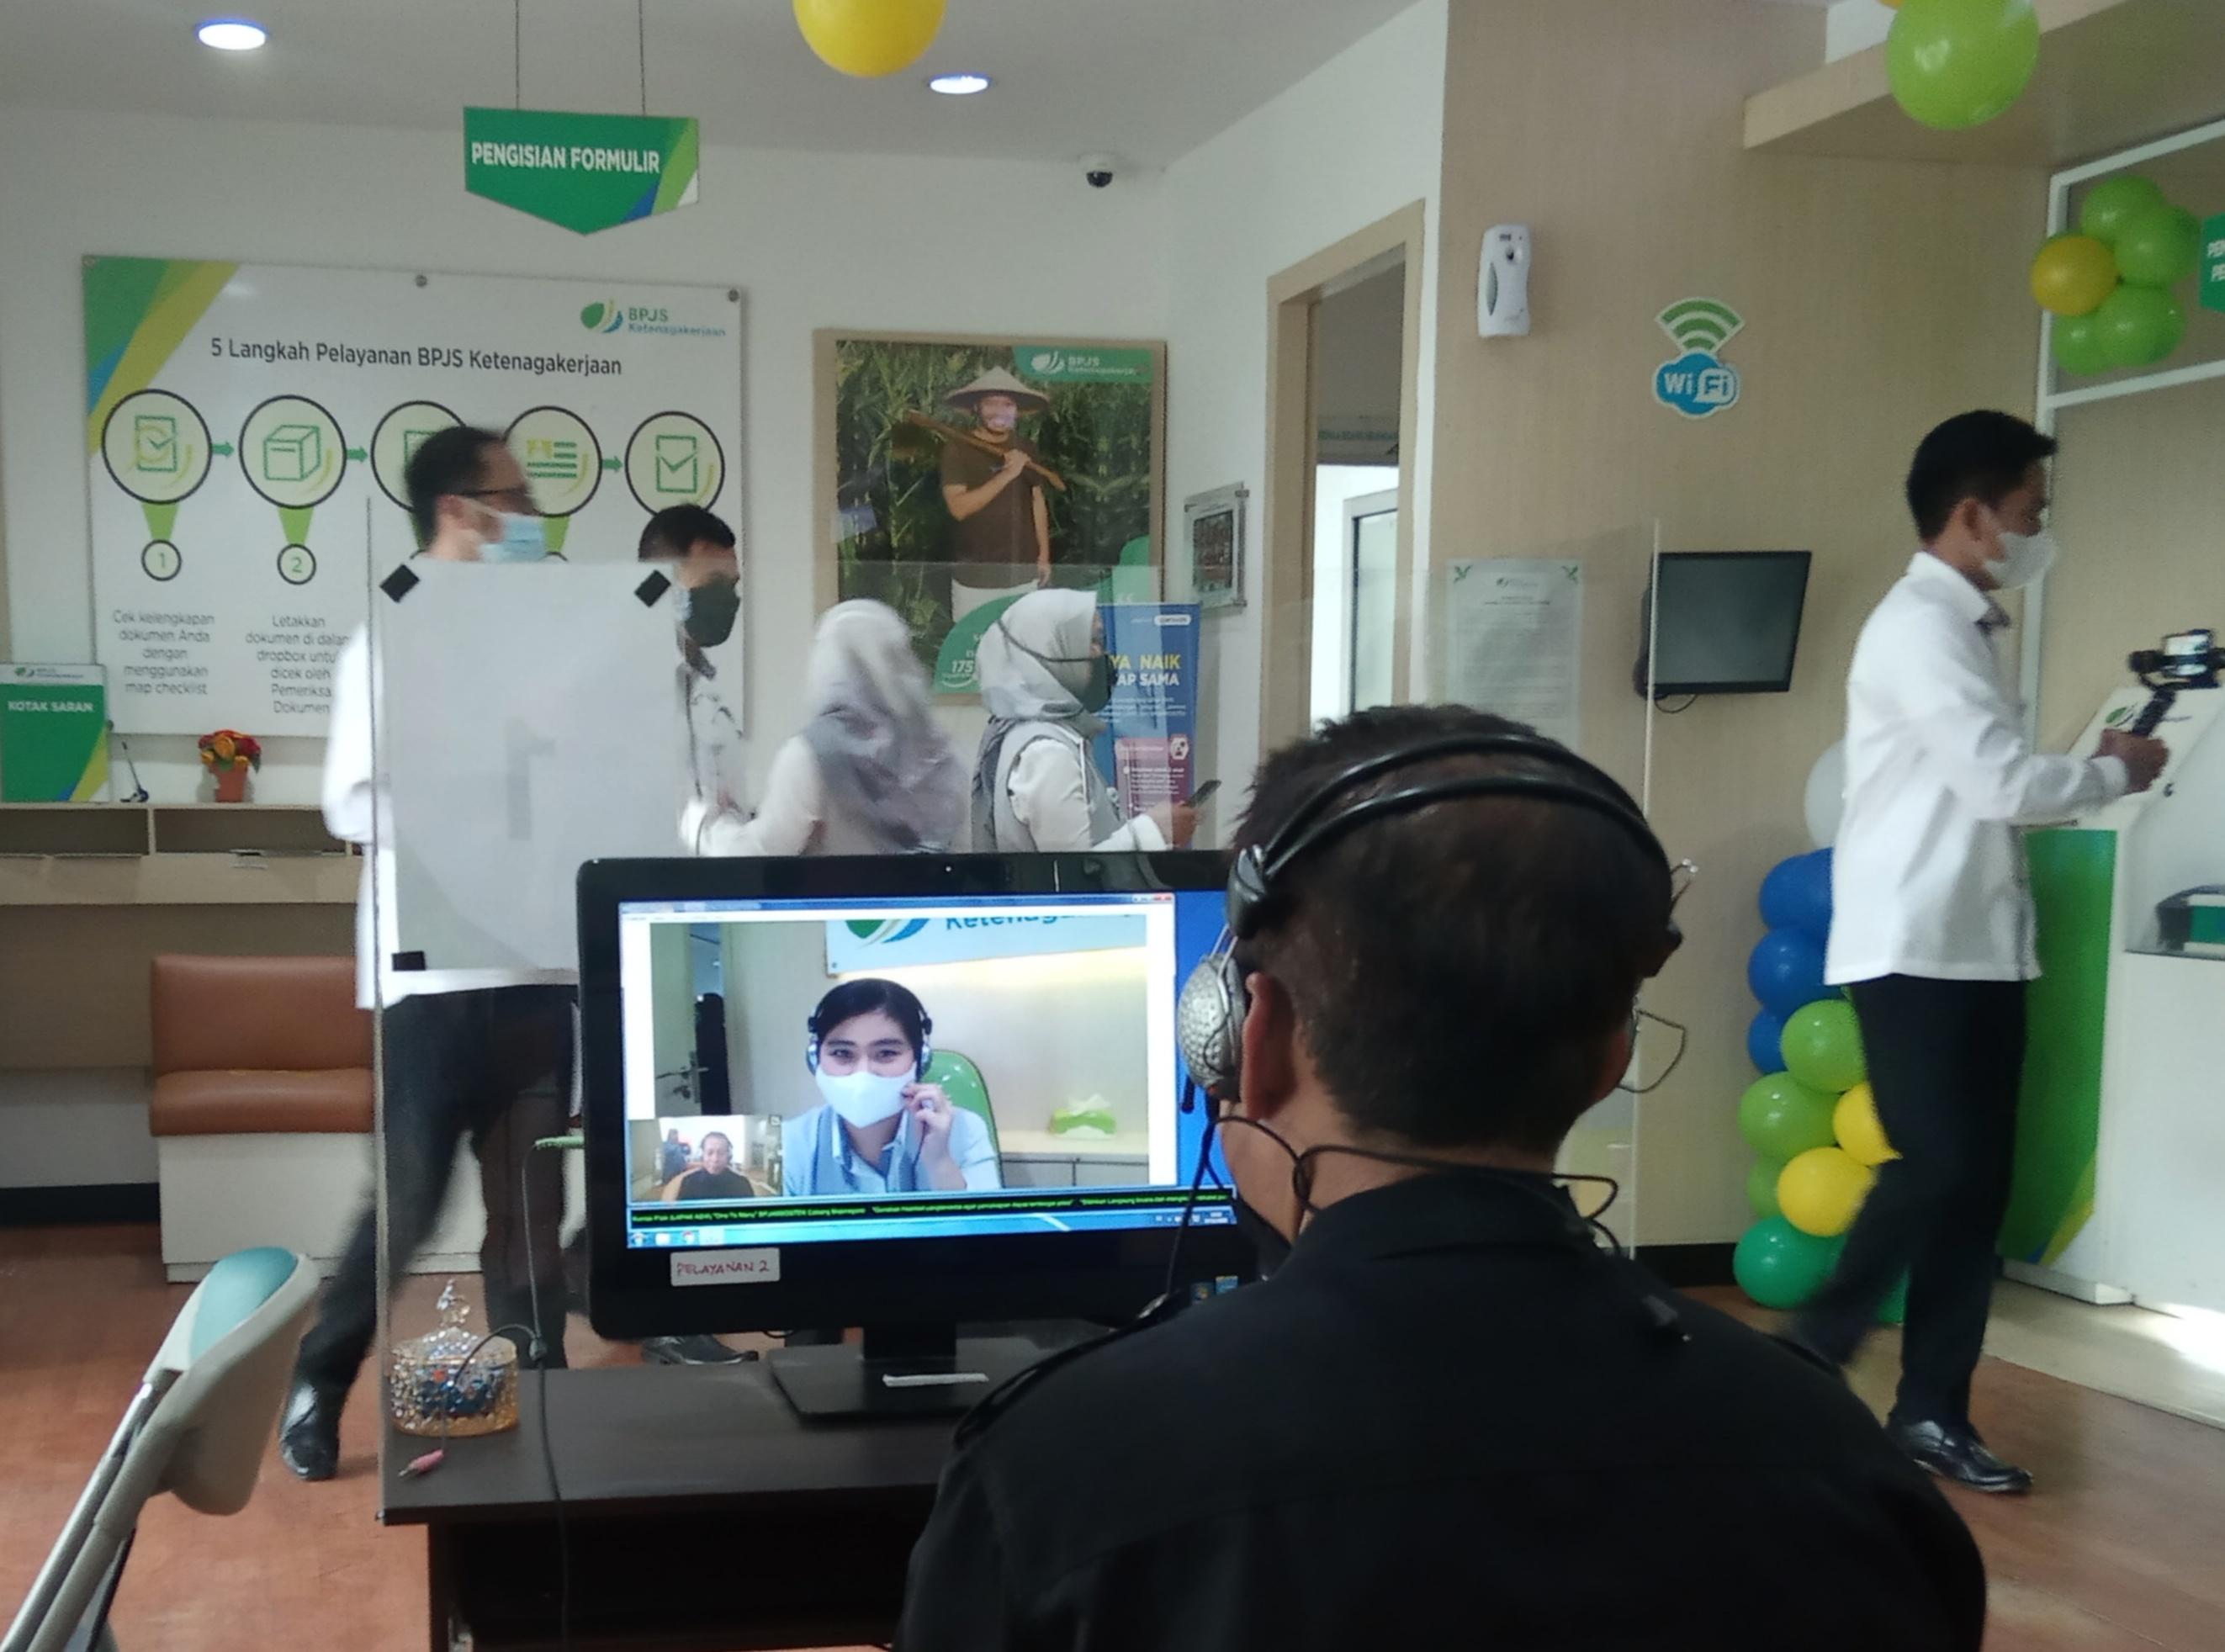 Lapak Asik Layanan Praktis Peserta Bpjs Ketenagakerjaan Saat Pandemi